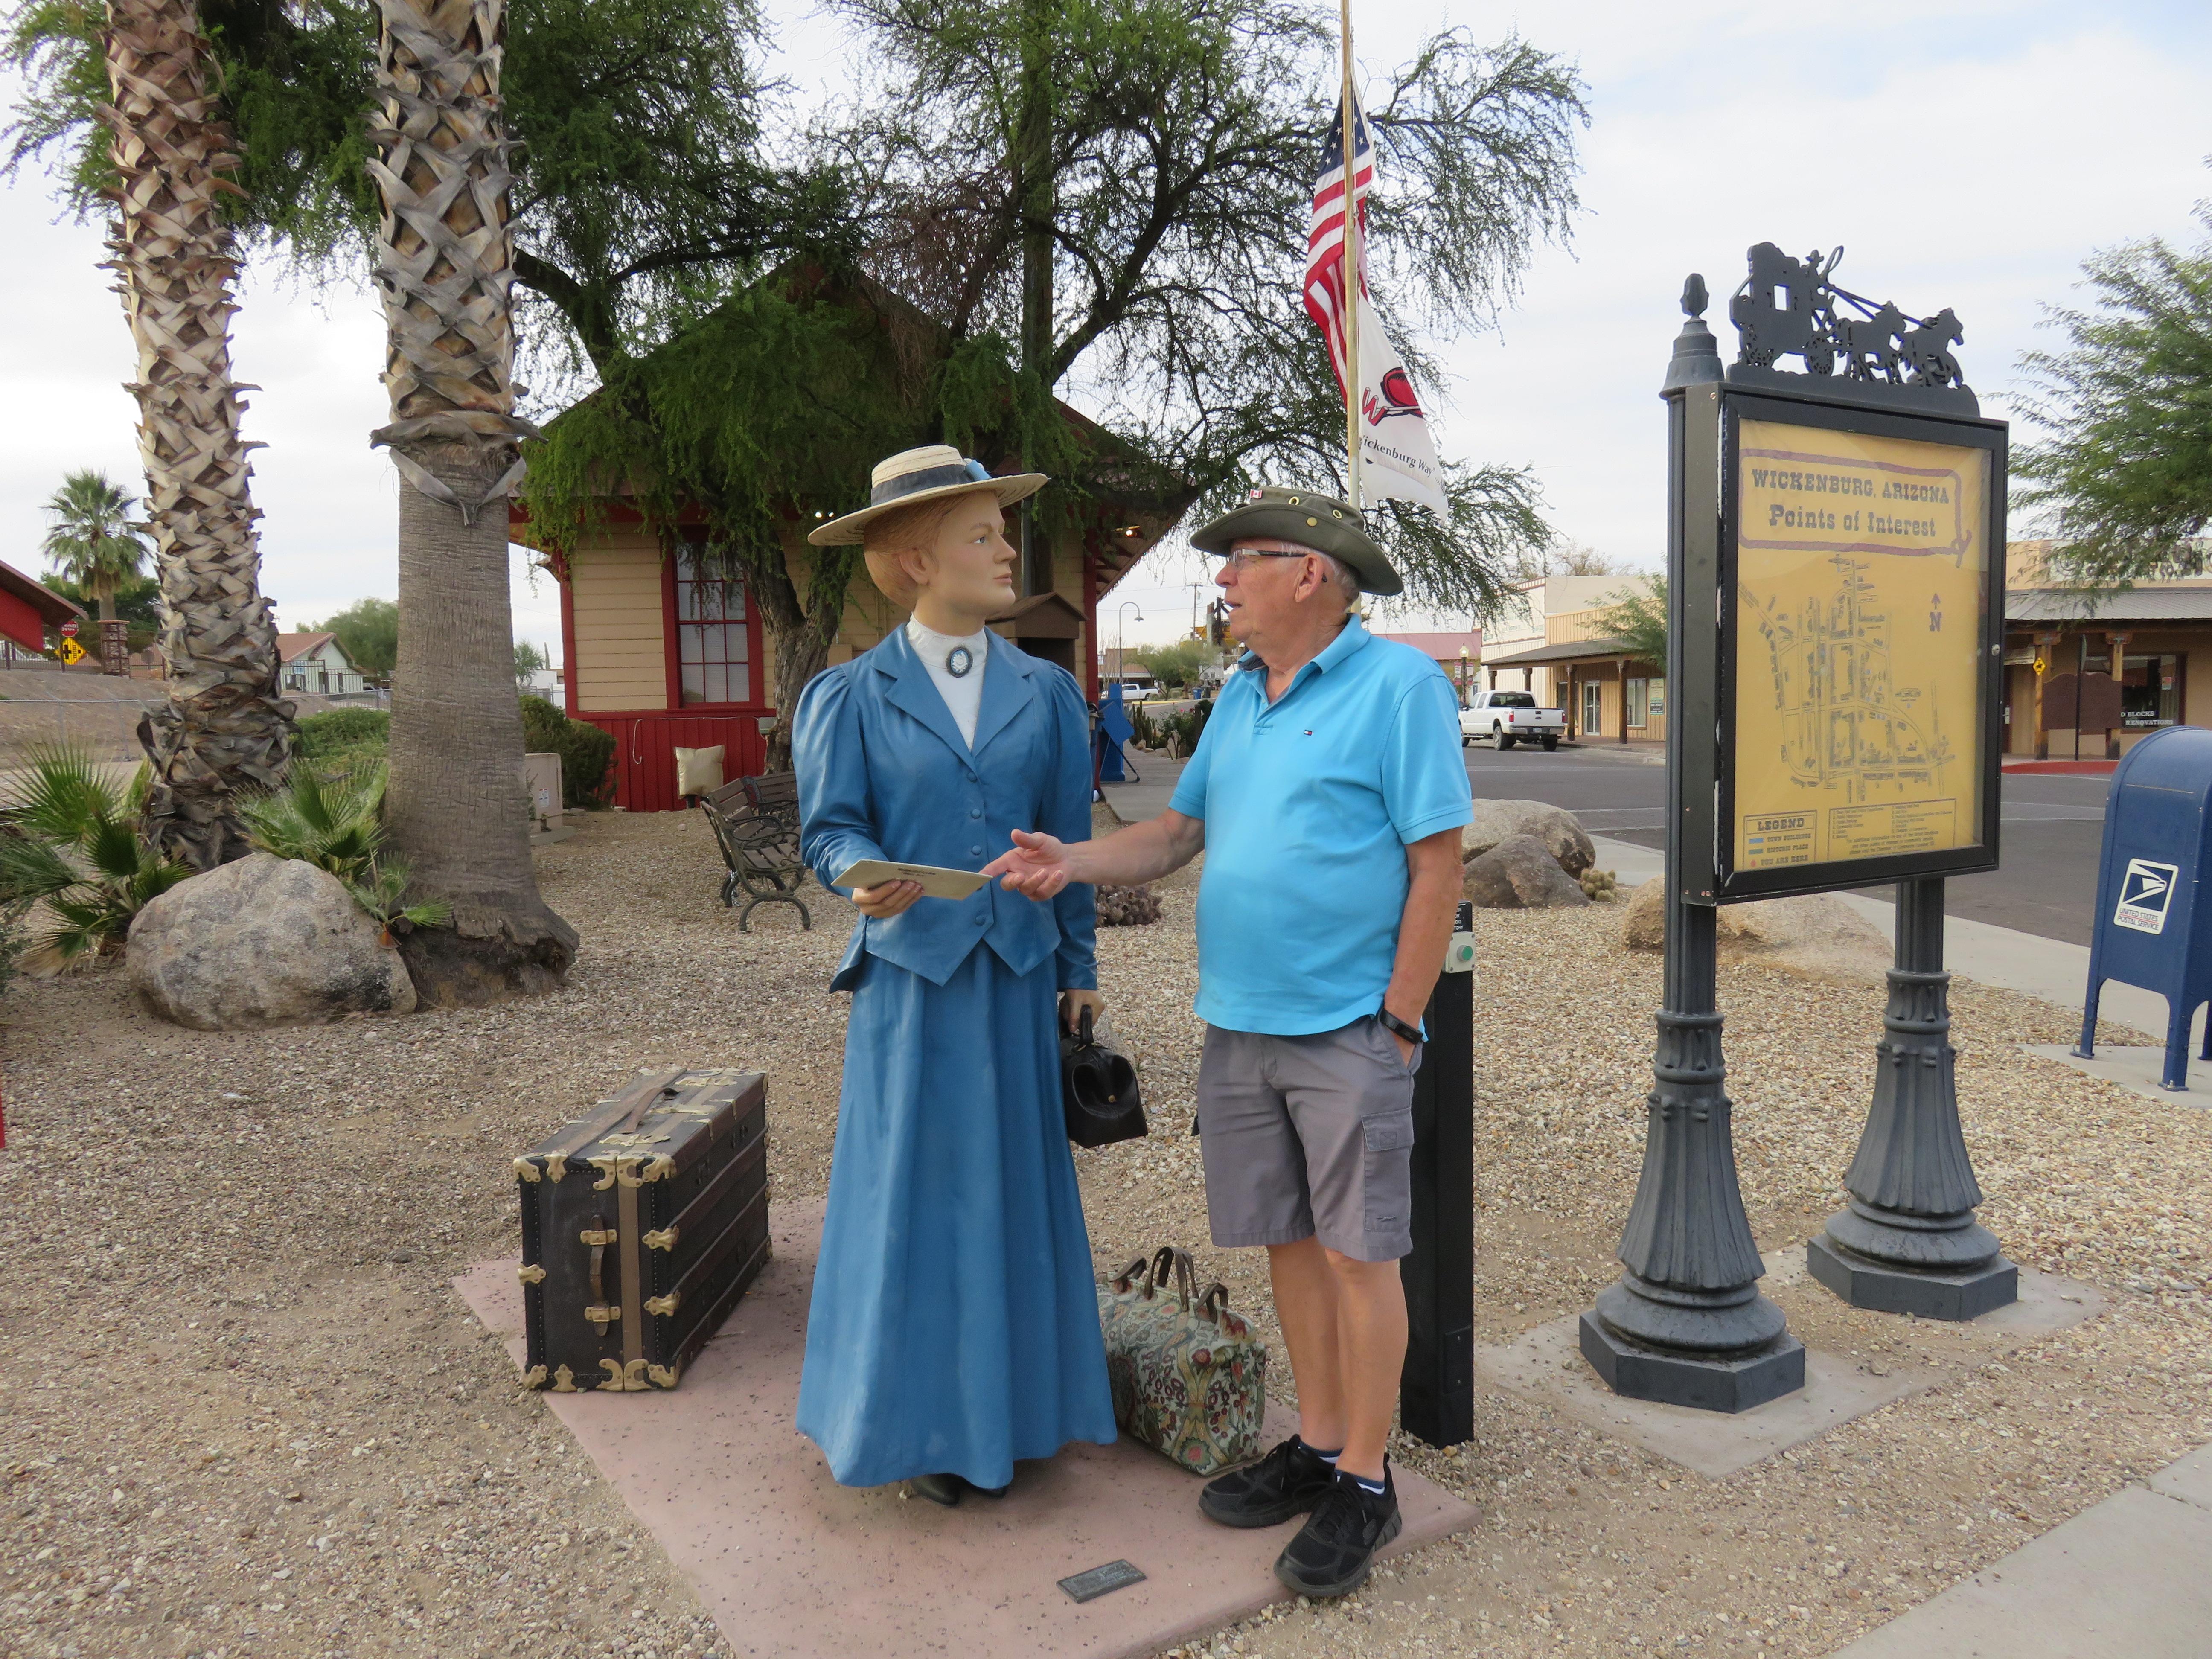 Jim and traveler